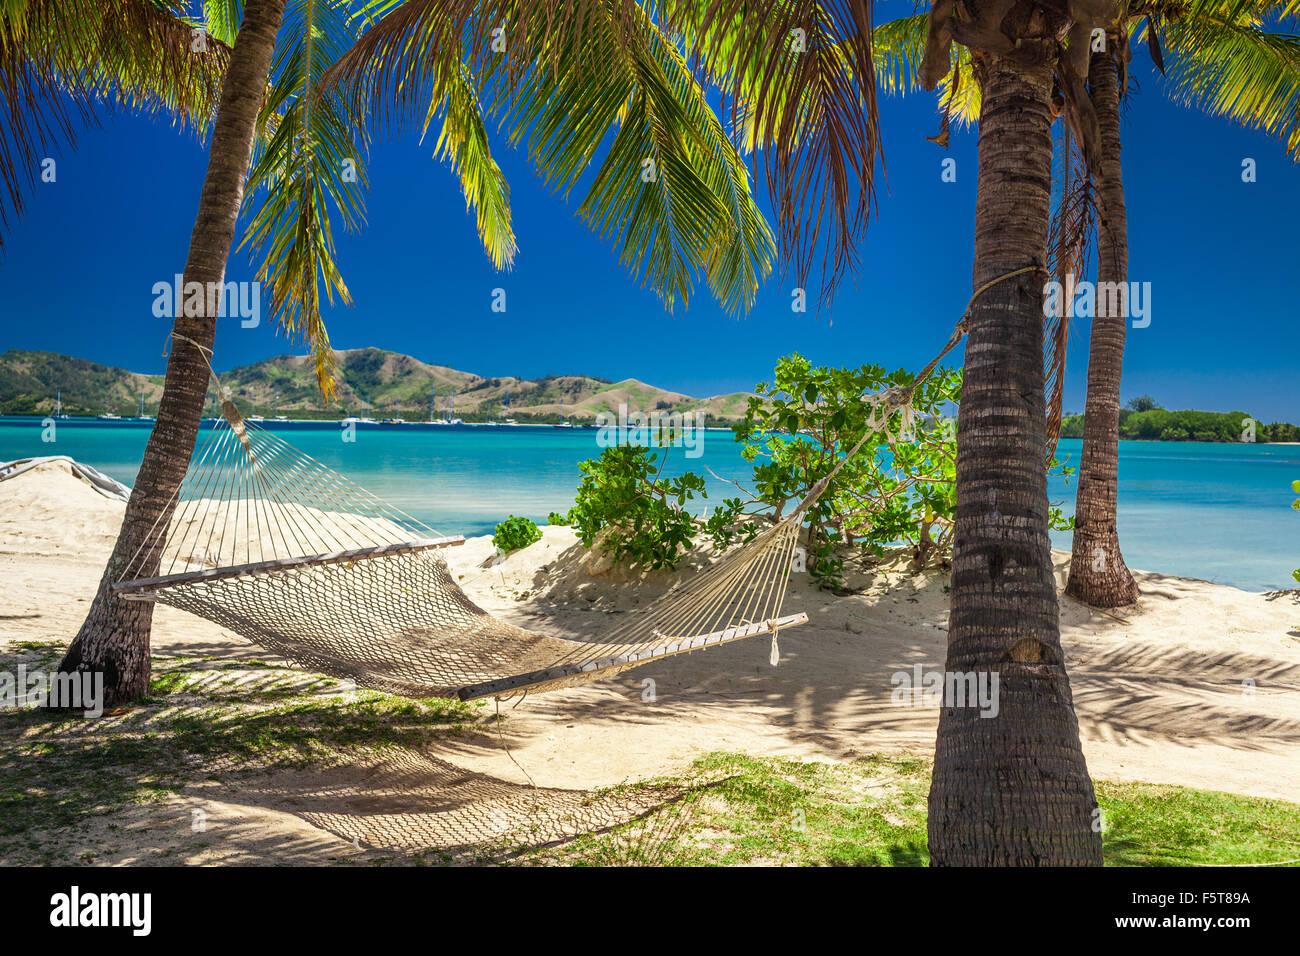 swing chair sri lanka xbox 360 gaming tree on palm beach stock photos and